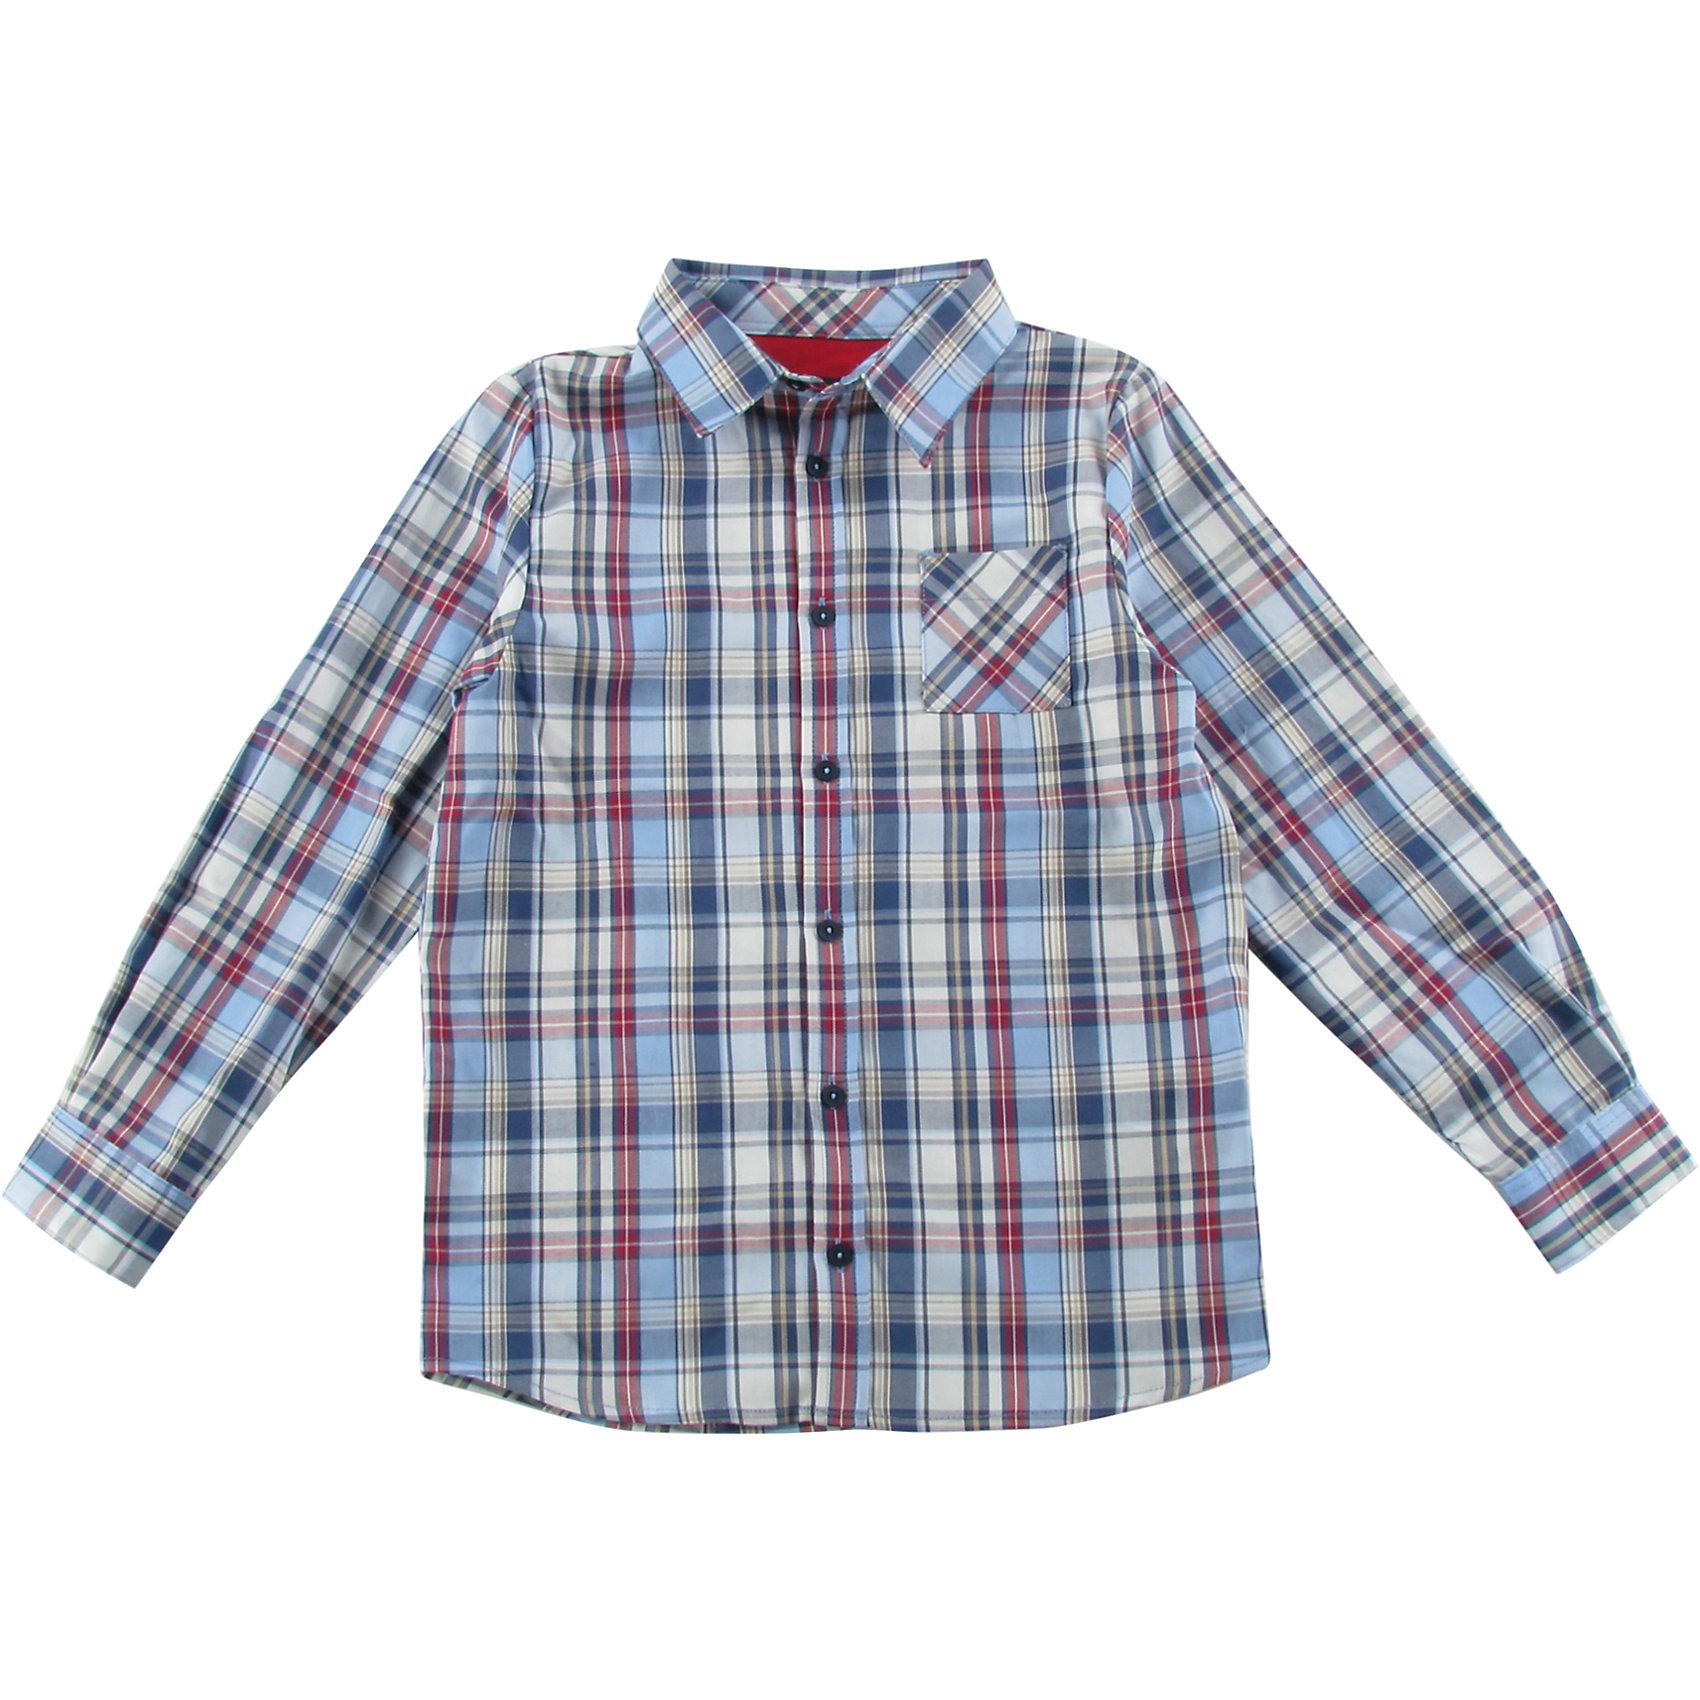 Рубашка для мальчика WojcikБлузки и рубашки<br>Рубашка для мальчика Wojcik<br>Состав:<br>Хлопок 100%<br><br>Ширина мм: 174<br>Глубина мм: 10<br>Высота мм: 169<br>Вес г: 157<br>Цвет: белый<br>Возраст от месяцев: 132<br>Возраст до месяцев: 144<br>Пол: Мужской<br>Возраст: Детский<br>Размер: 152,128,134,140,146<br>SKU: 5592260